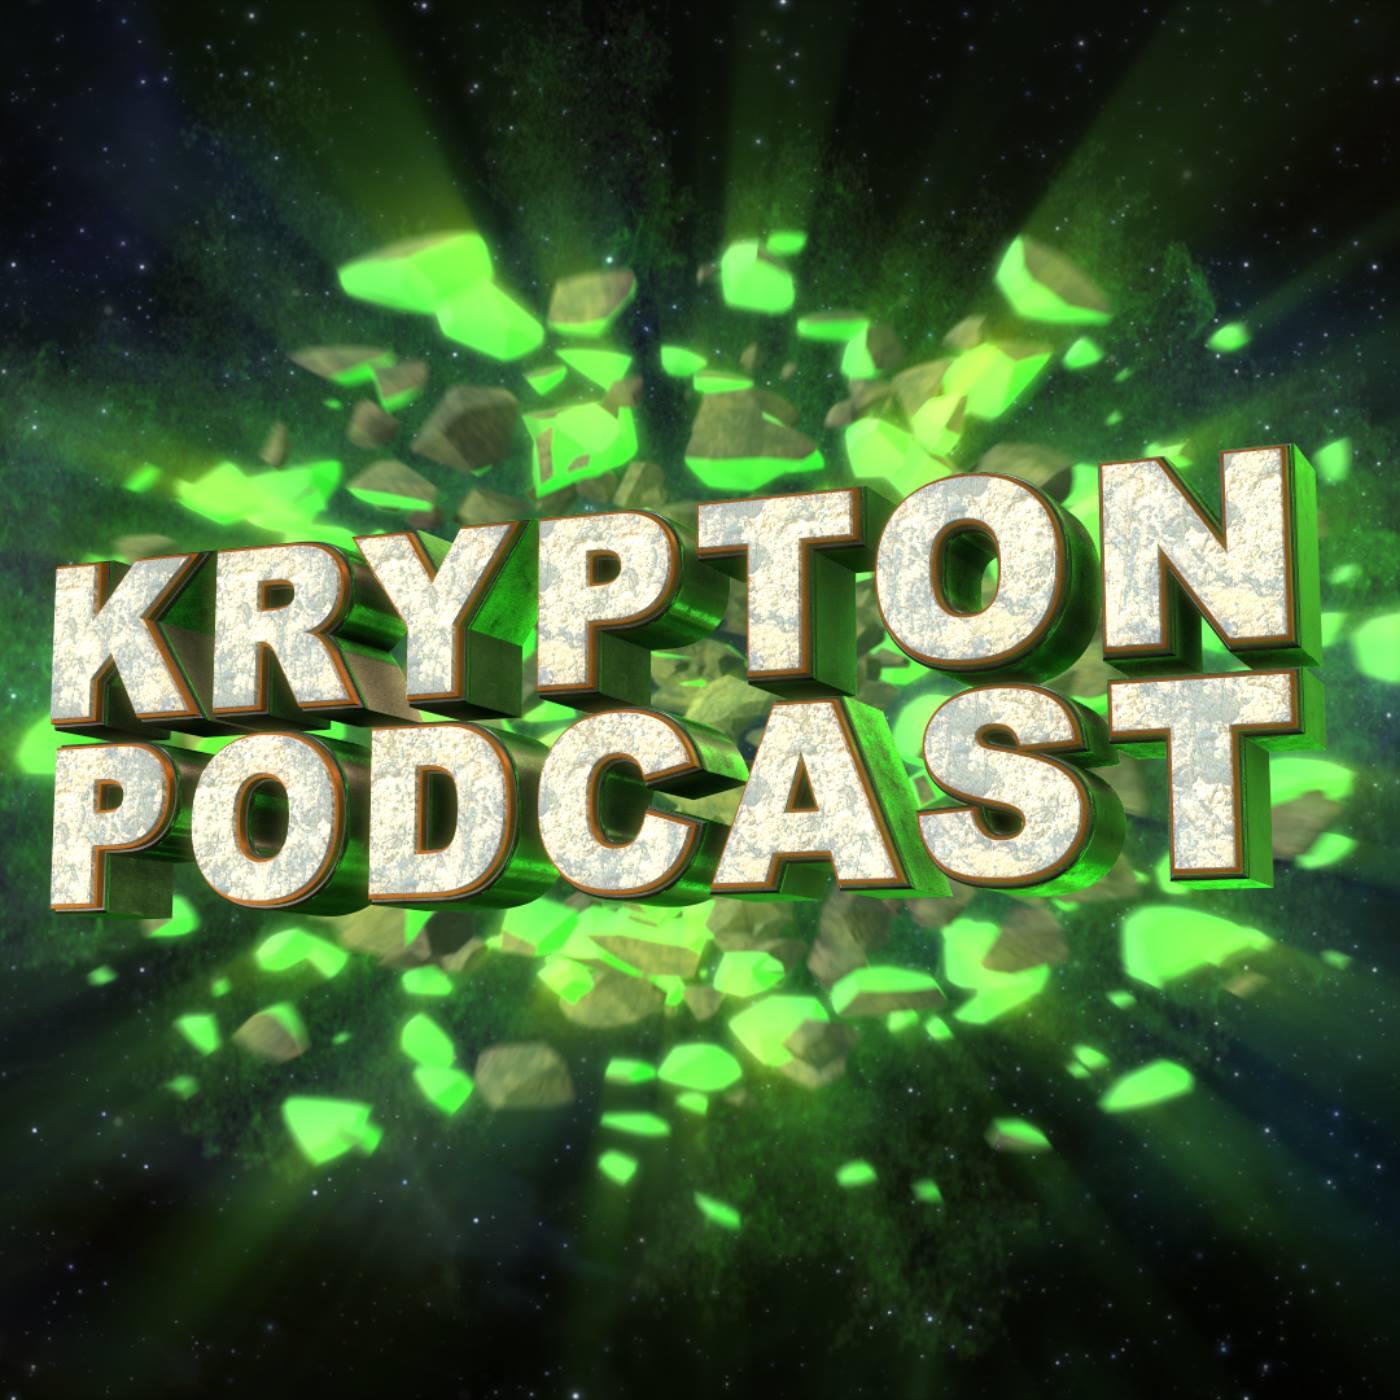 Krypton Podcast on TalkingTimelords.com